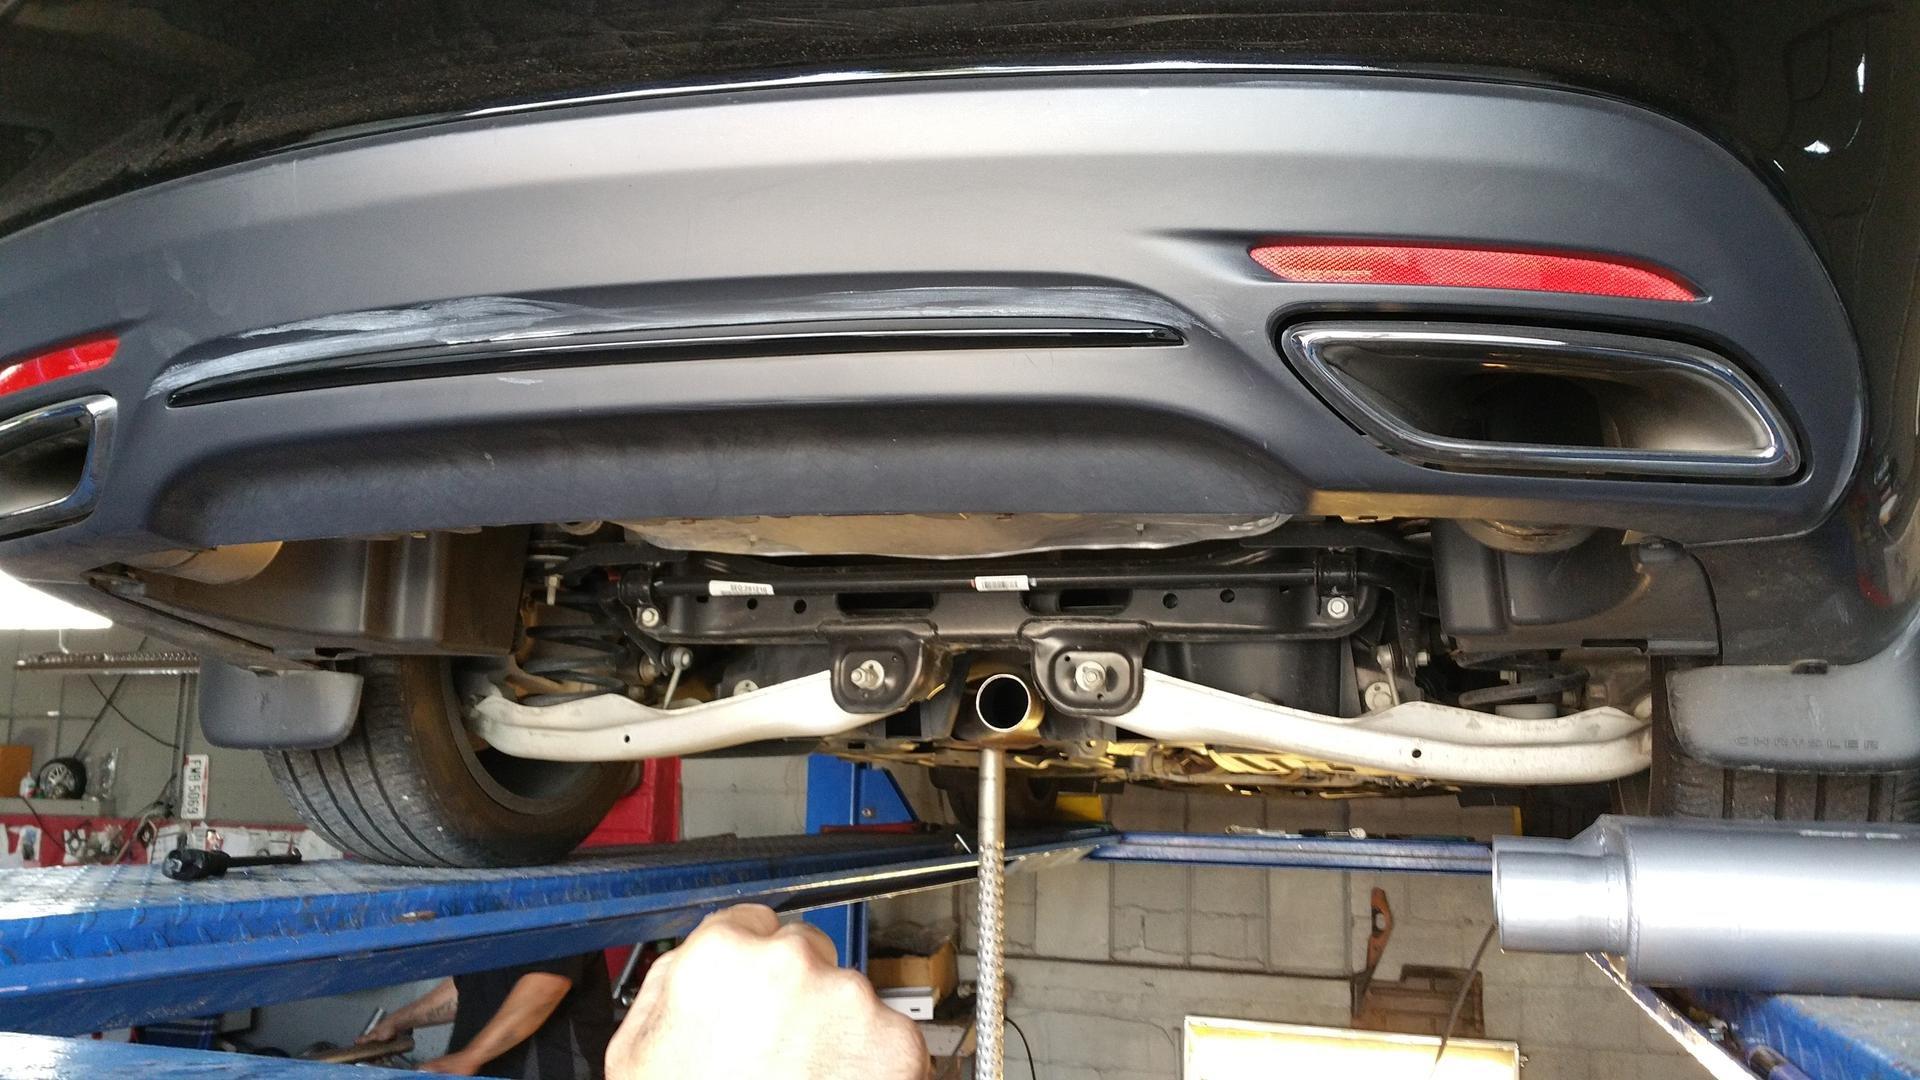 2015 Chrysler 200s Fwd 3 6l New Exhaust Flowaster 80